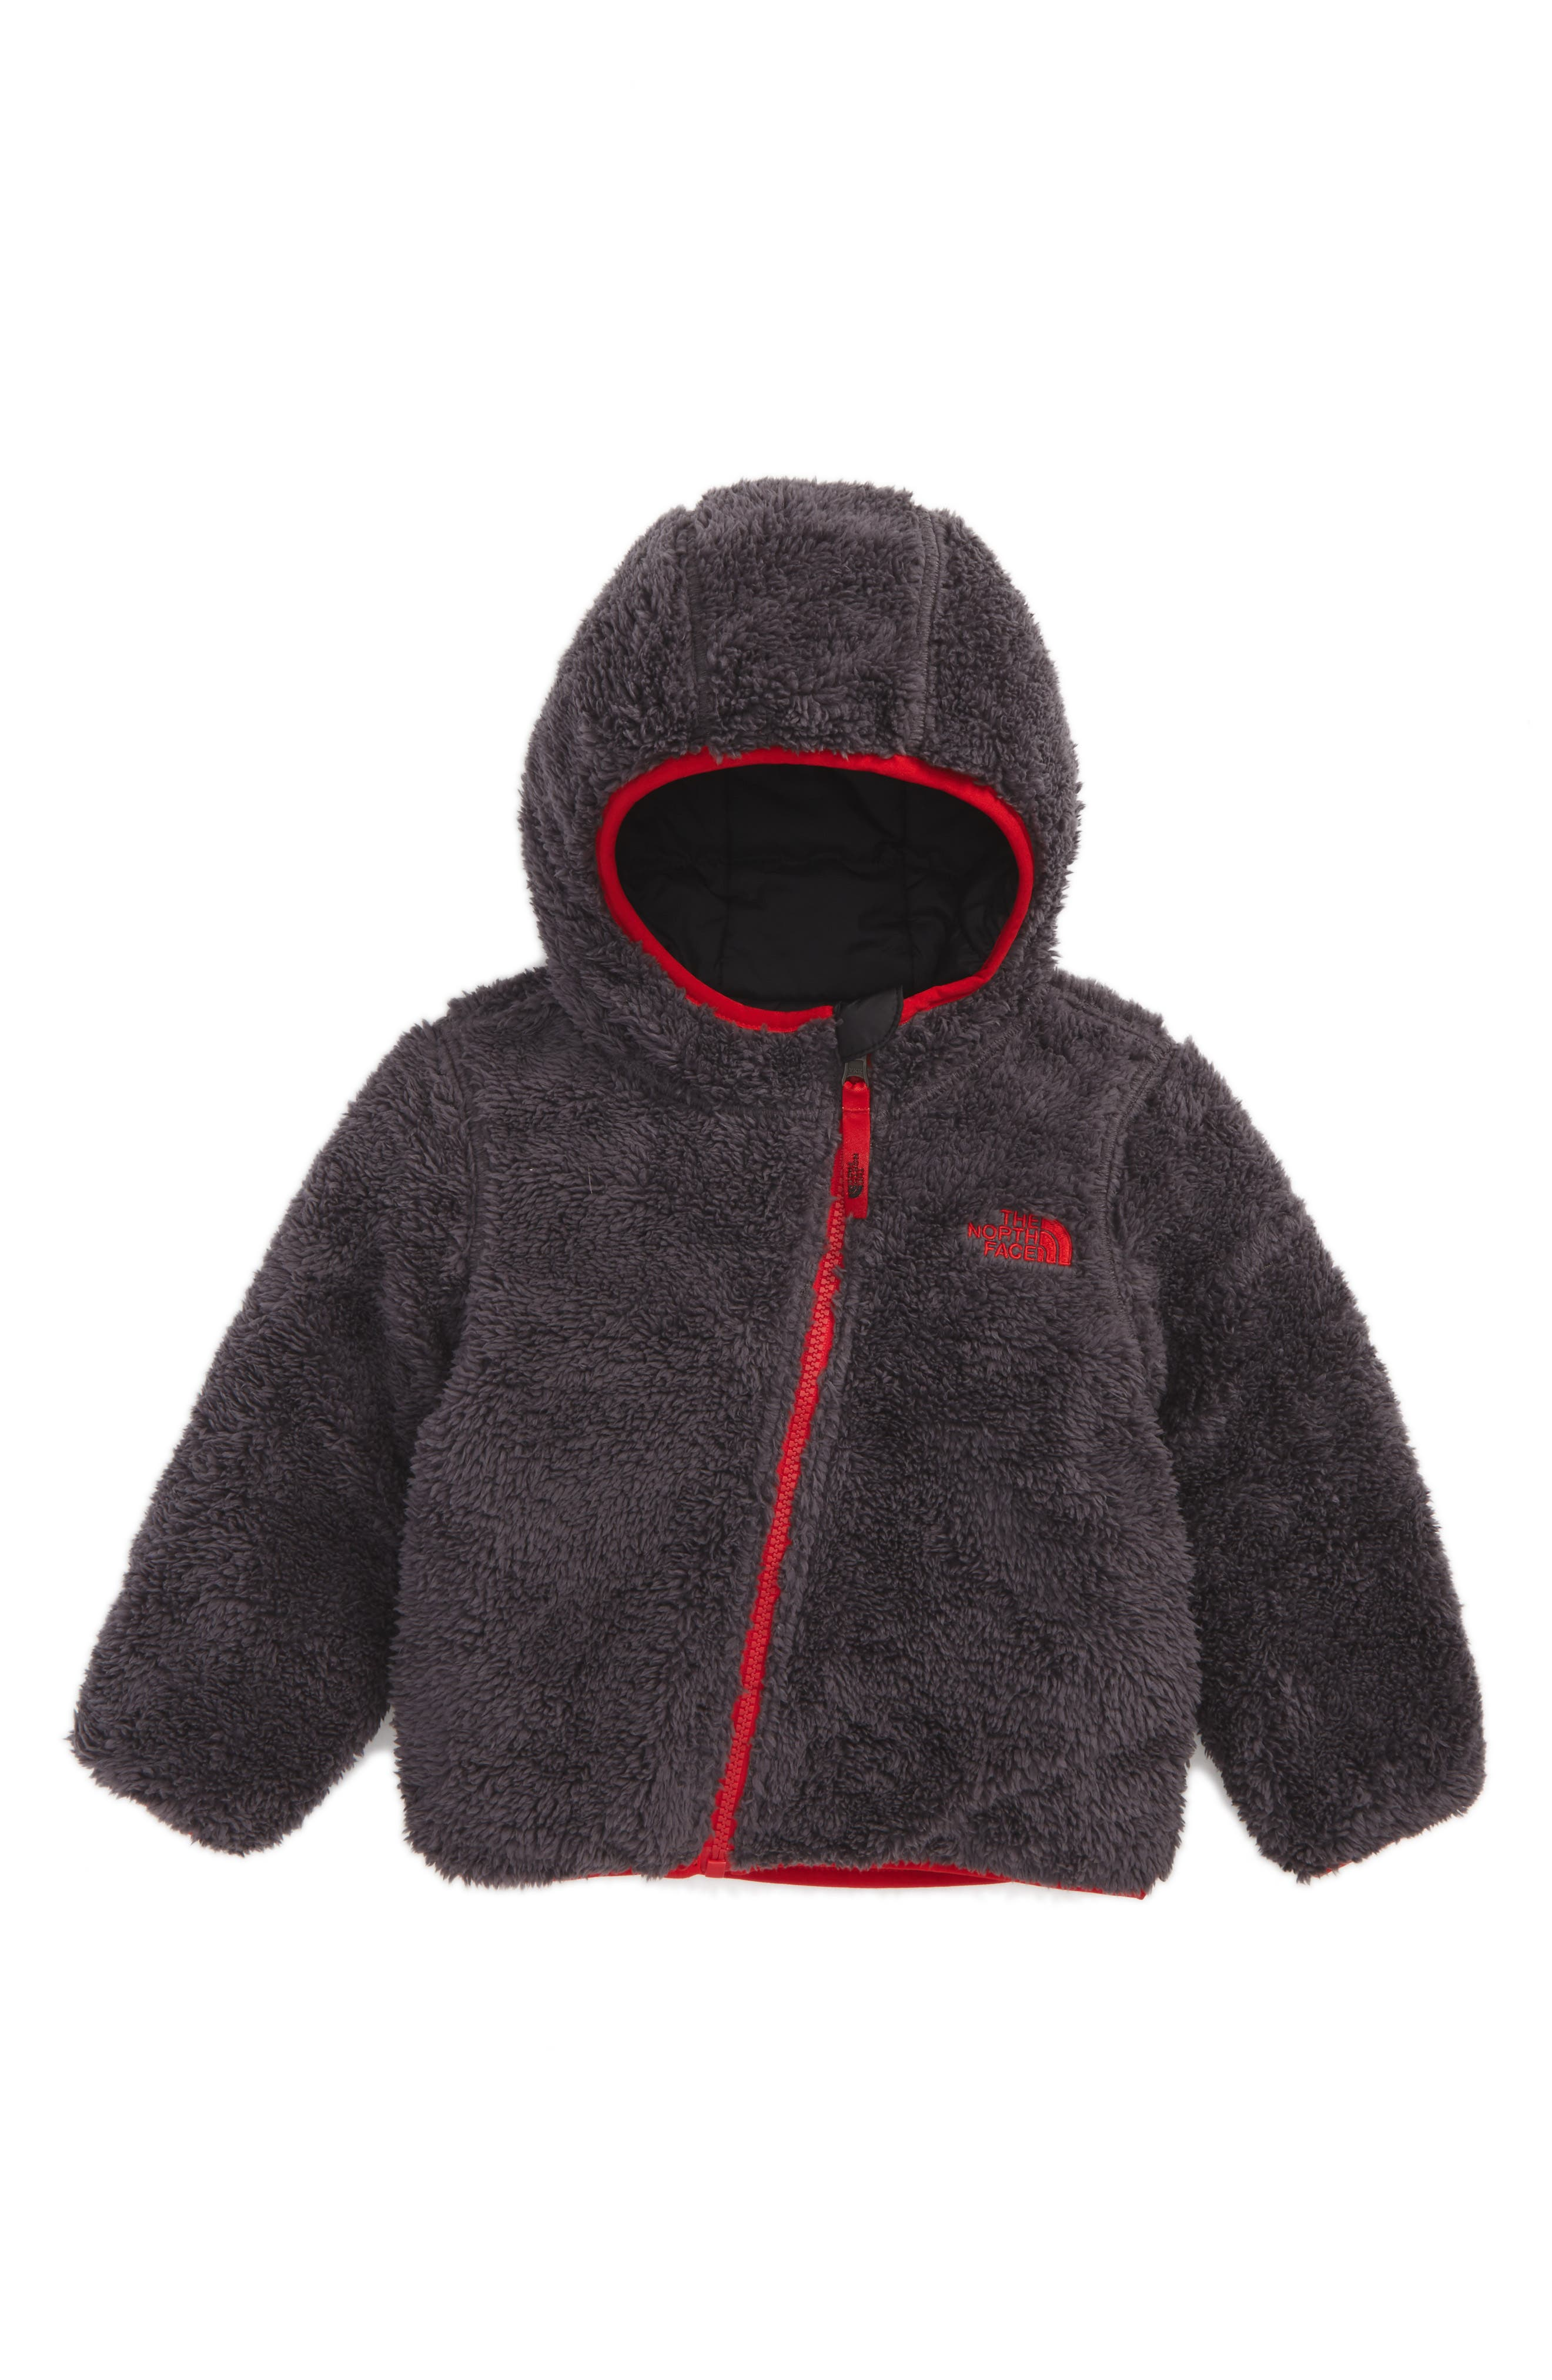 Mount Chimborazo Reversible Jacket,                             Alternate thumbnail 2, color,                             100